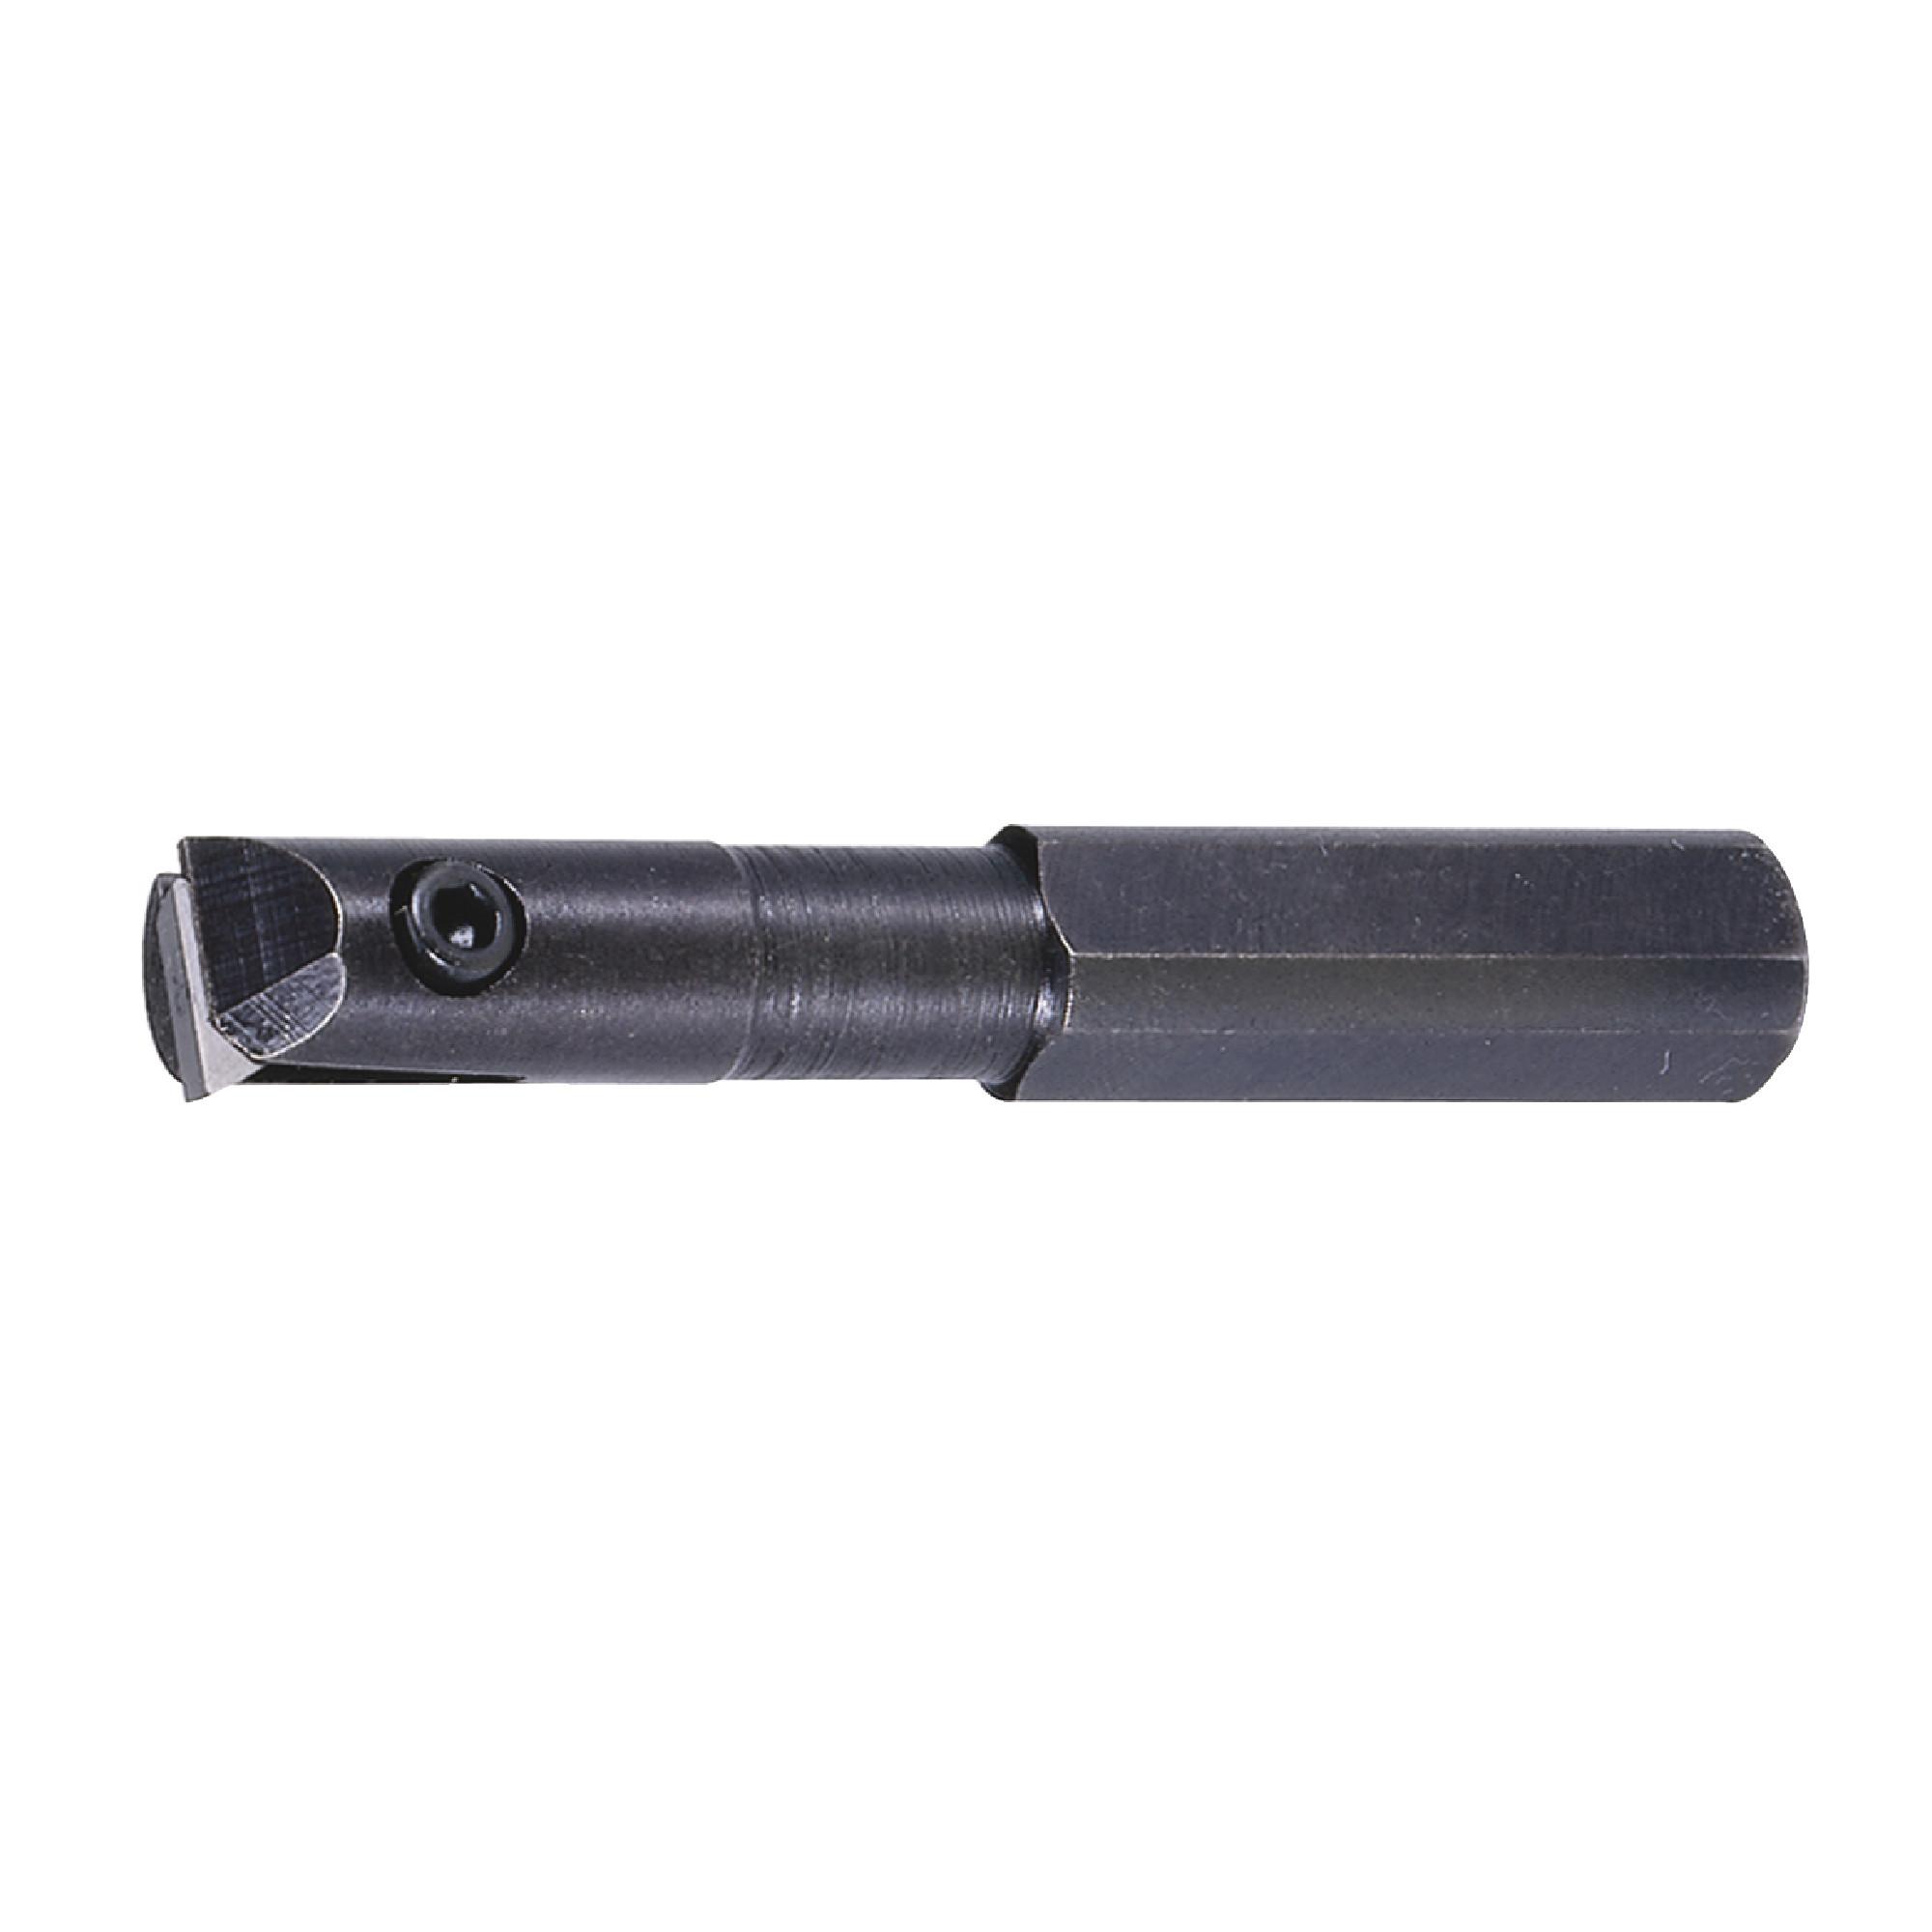 "APT - LB10M Boring Bar / 1/2"" Shank / 4.5"" Overall Length / TPG22_ / Right Hand"